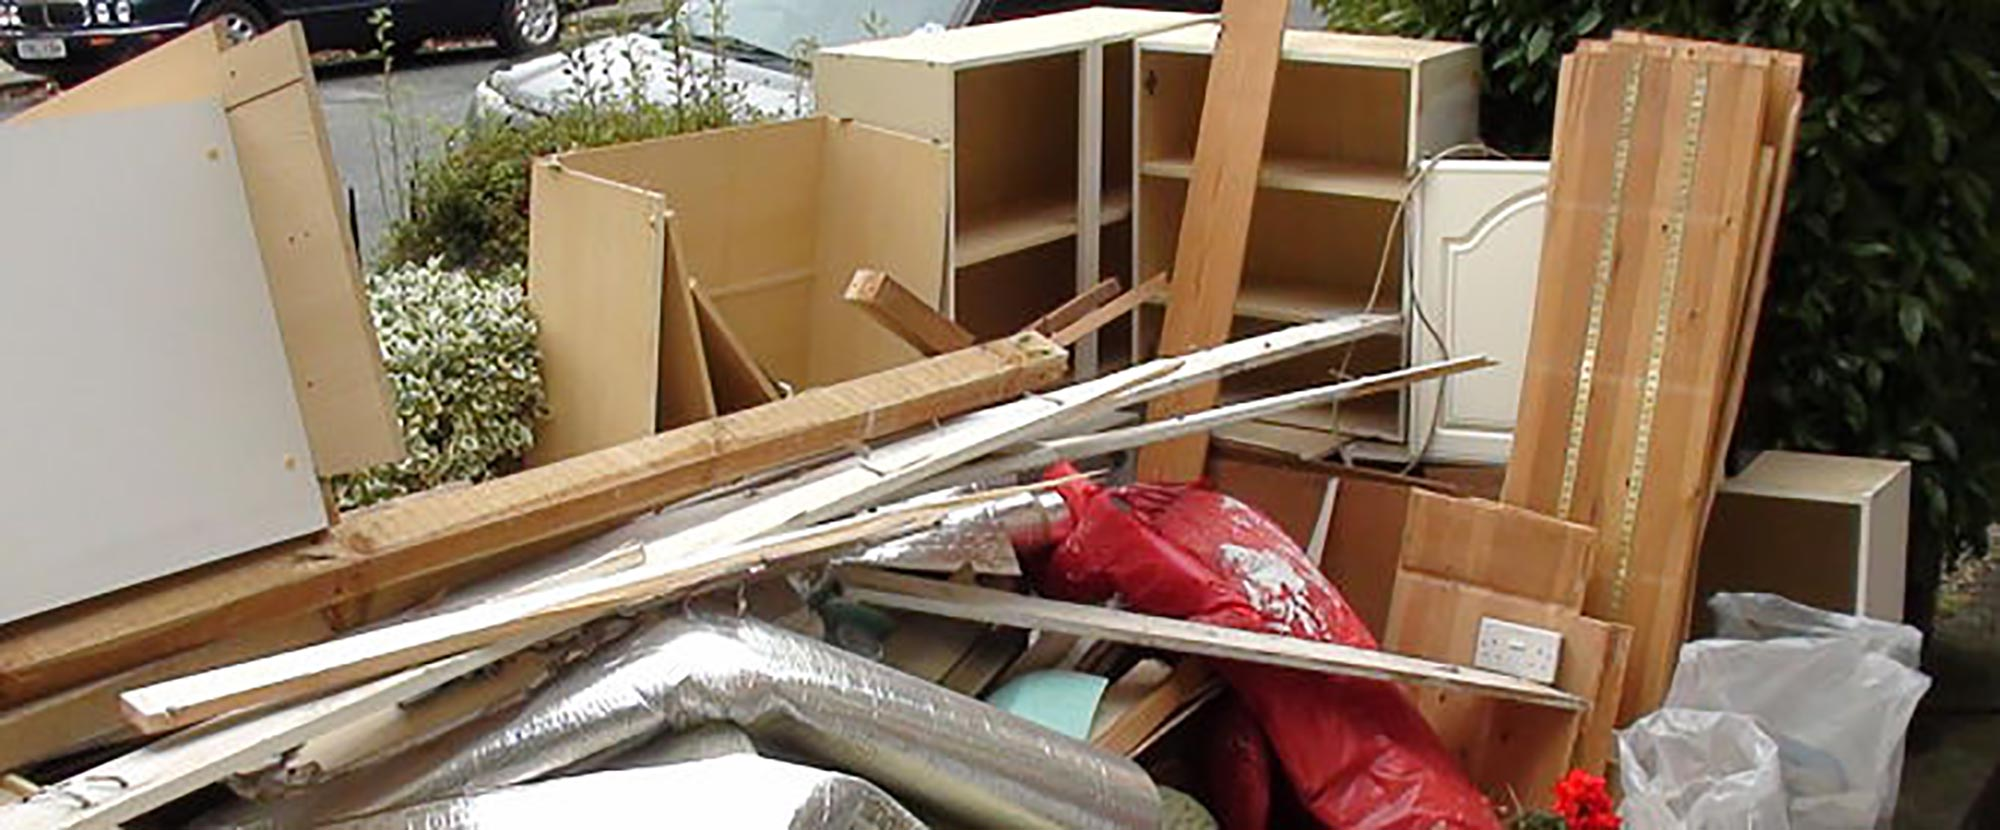 Old Kitchen Disposal London